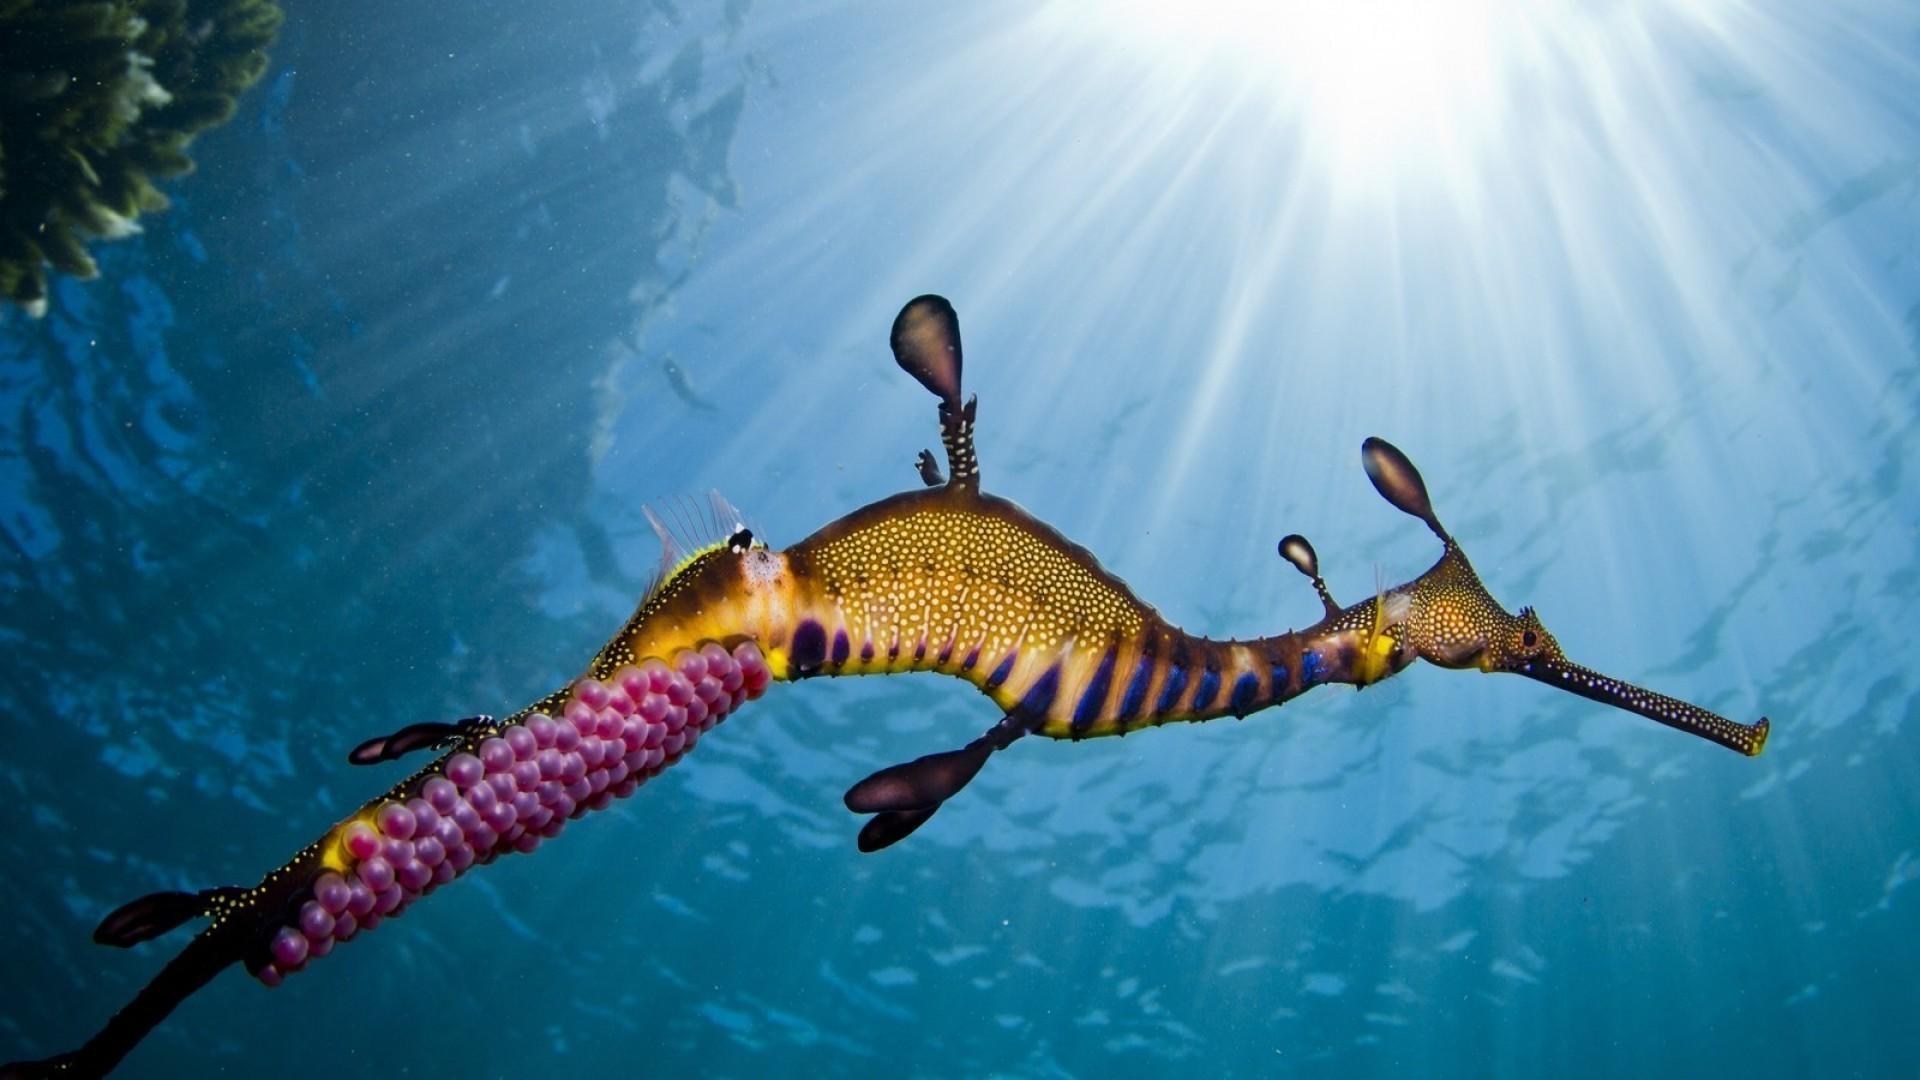 Hd Ocean Life Wallpapers Seahorse Wallpaper 183 ① Wallpapertag